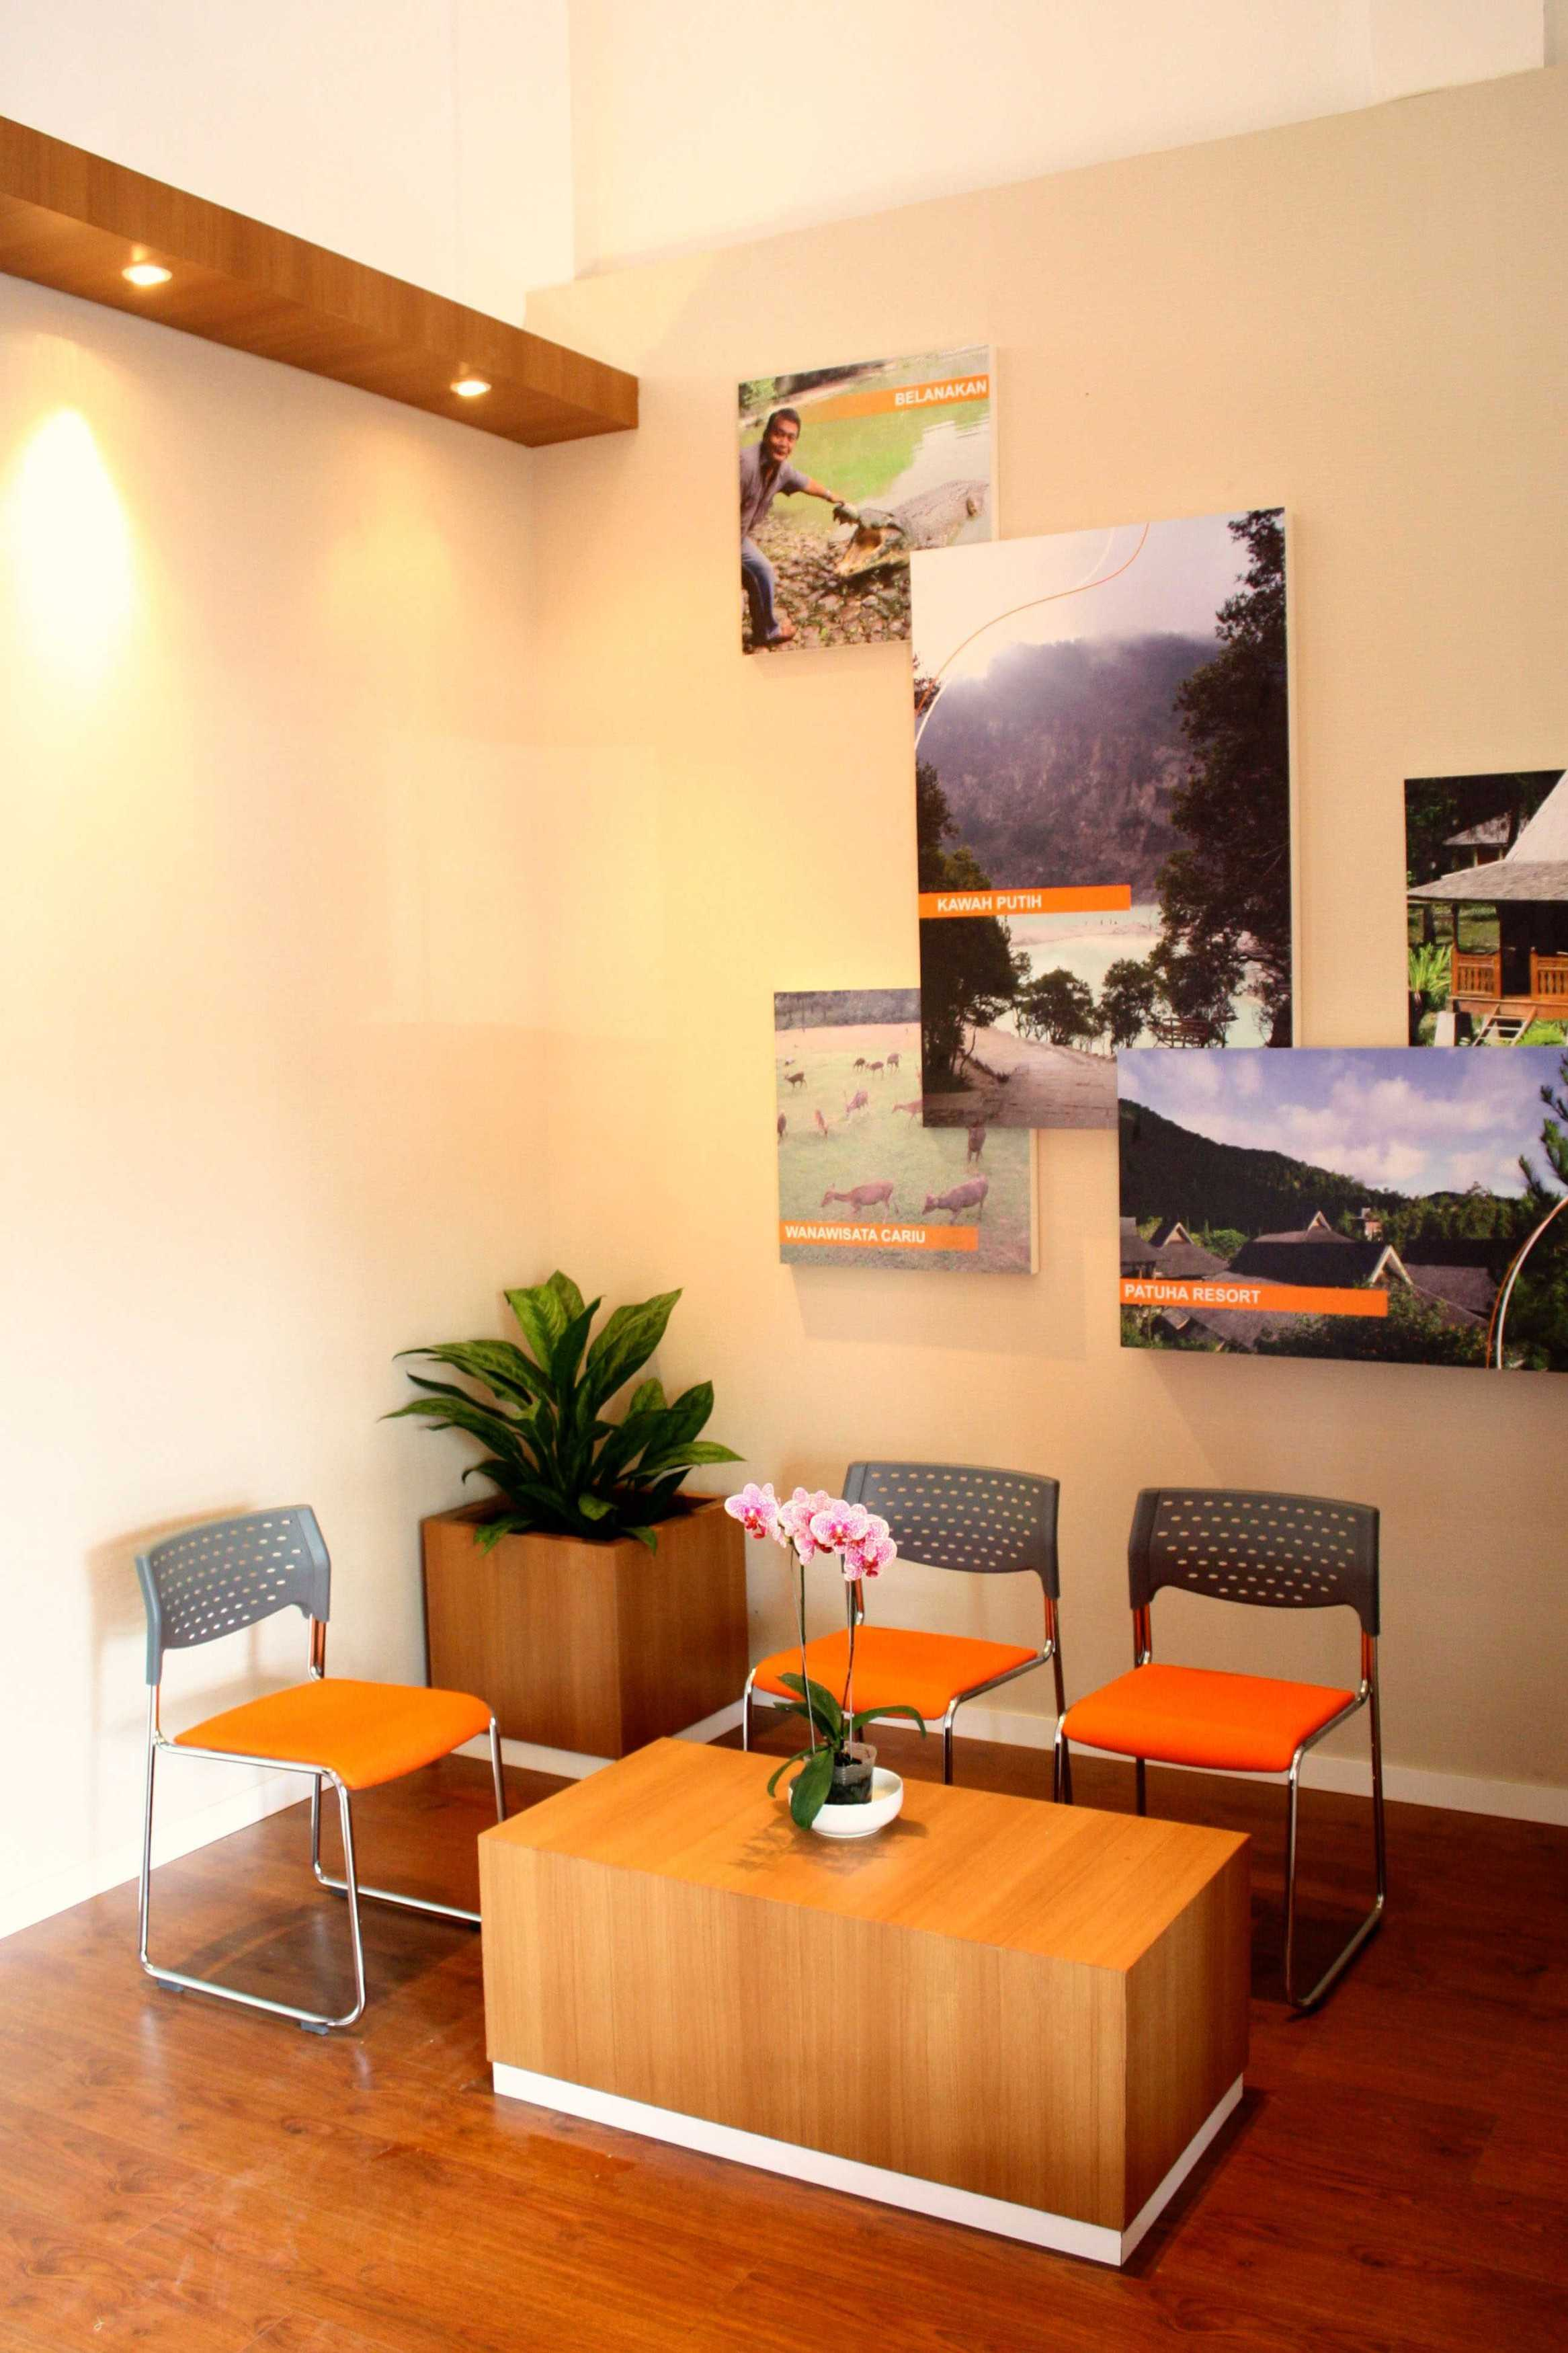 Gia Ginanjar Ecotourism Centre Perhutani Laswi, Baleendah, Bandung, Jawa Barat 40375, Indonesia Laswi, Baleendah, Bandung, Jawa Barat 40375, Indonesia Gia-Ginanjar-Ecotourism-Centre-Perhutani Modern <P>Lobby</p> 55726